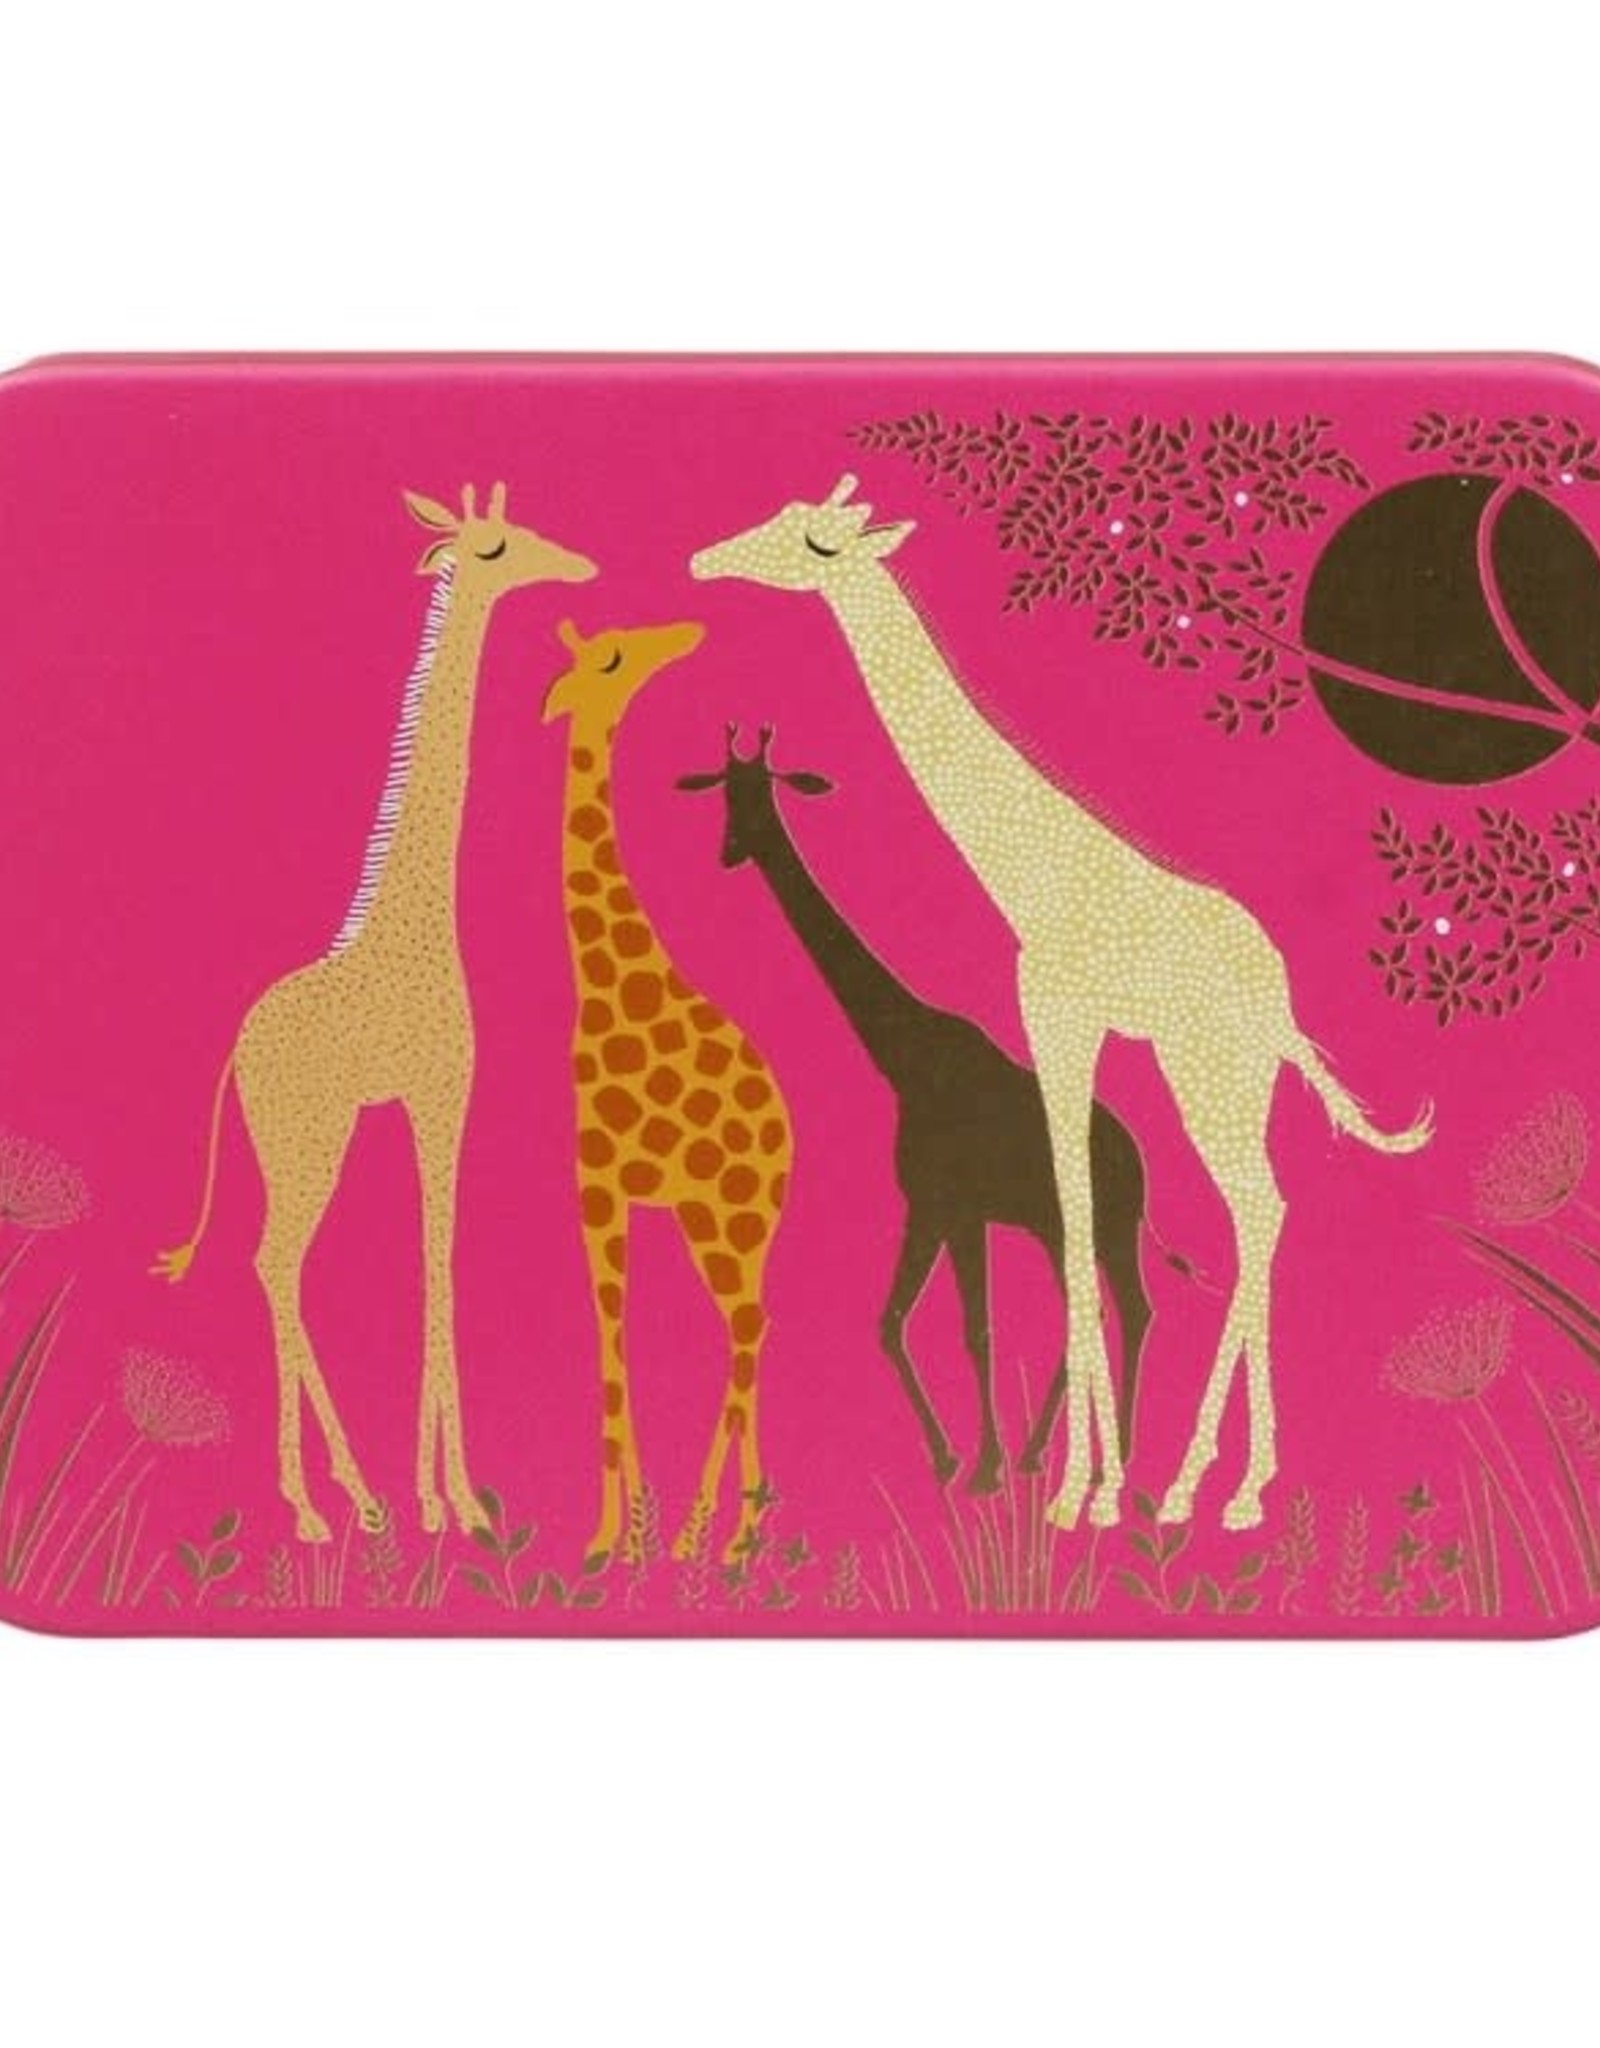 Blik Small Giraffes - Sara Miller London